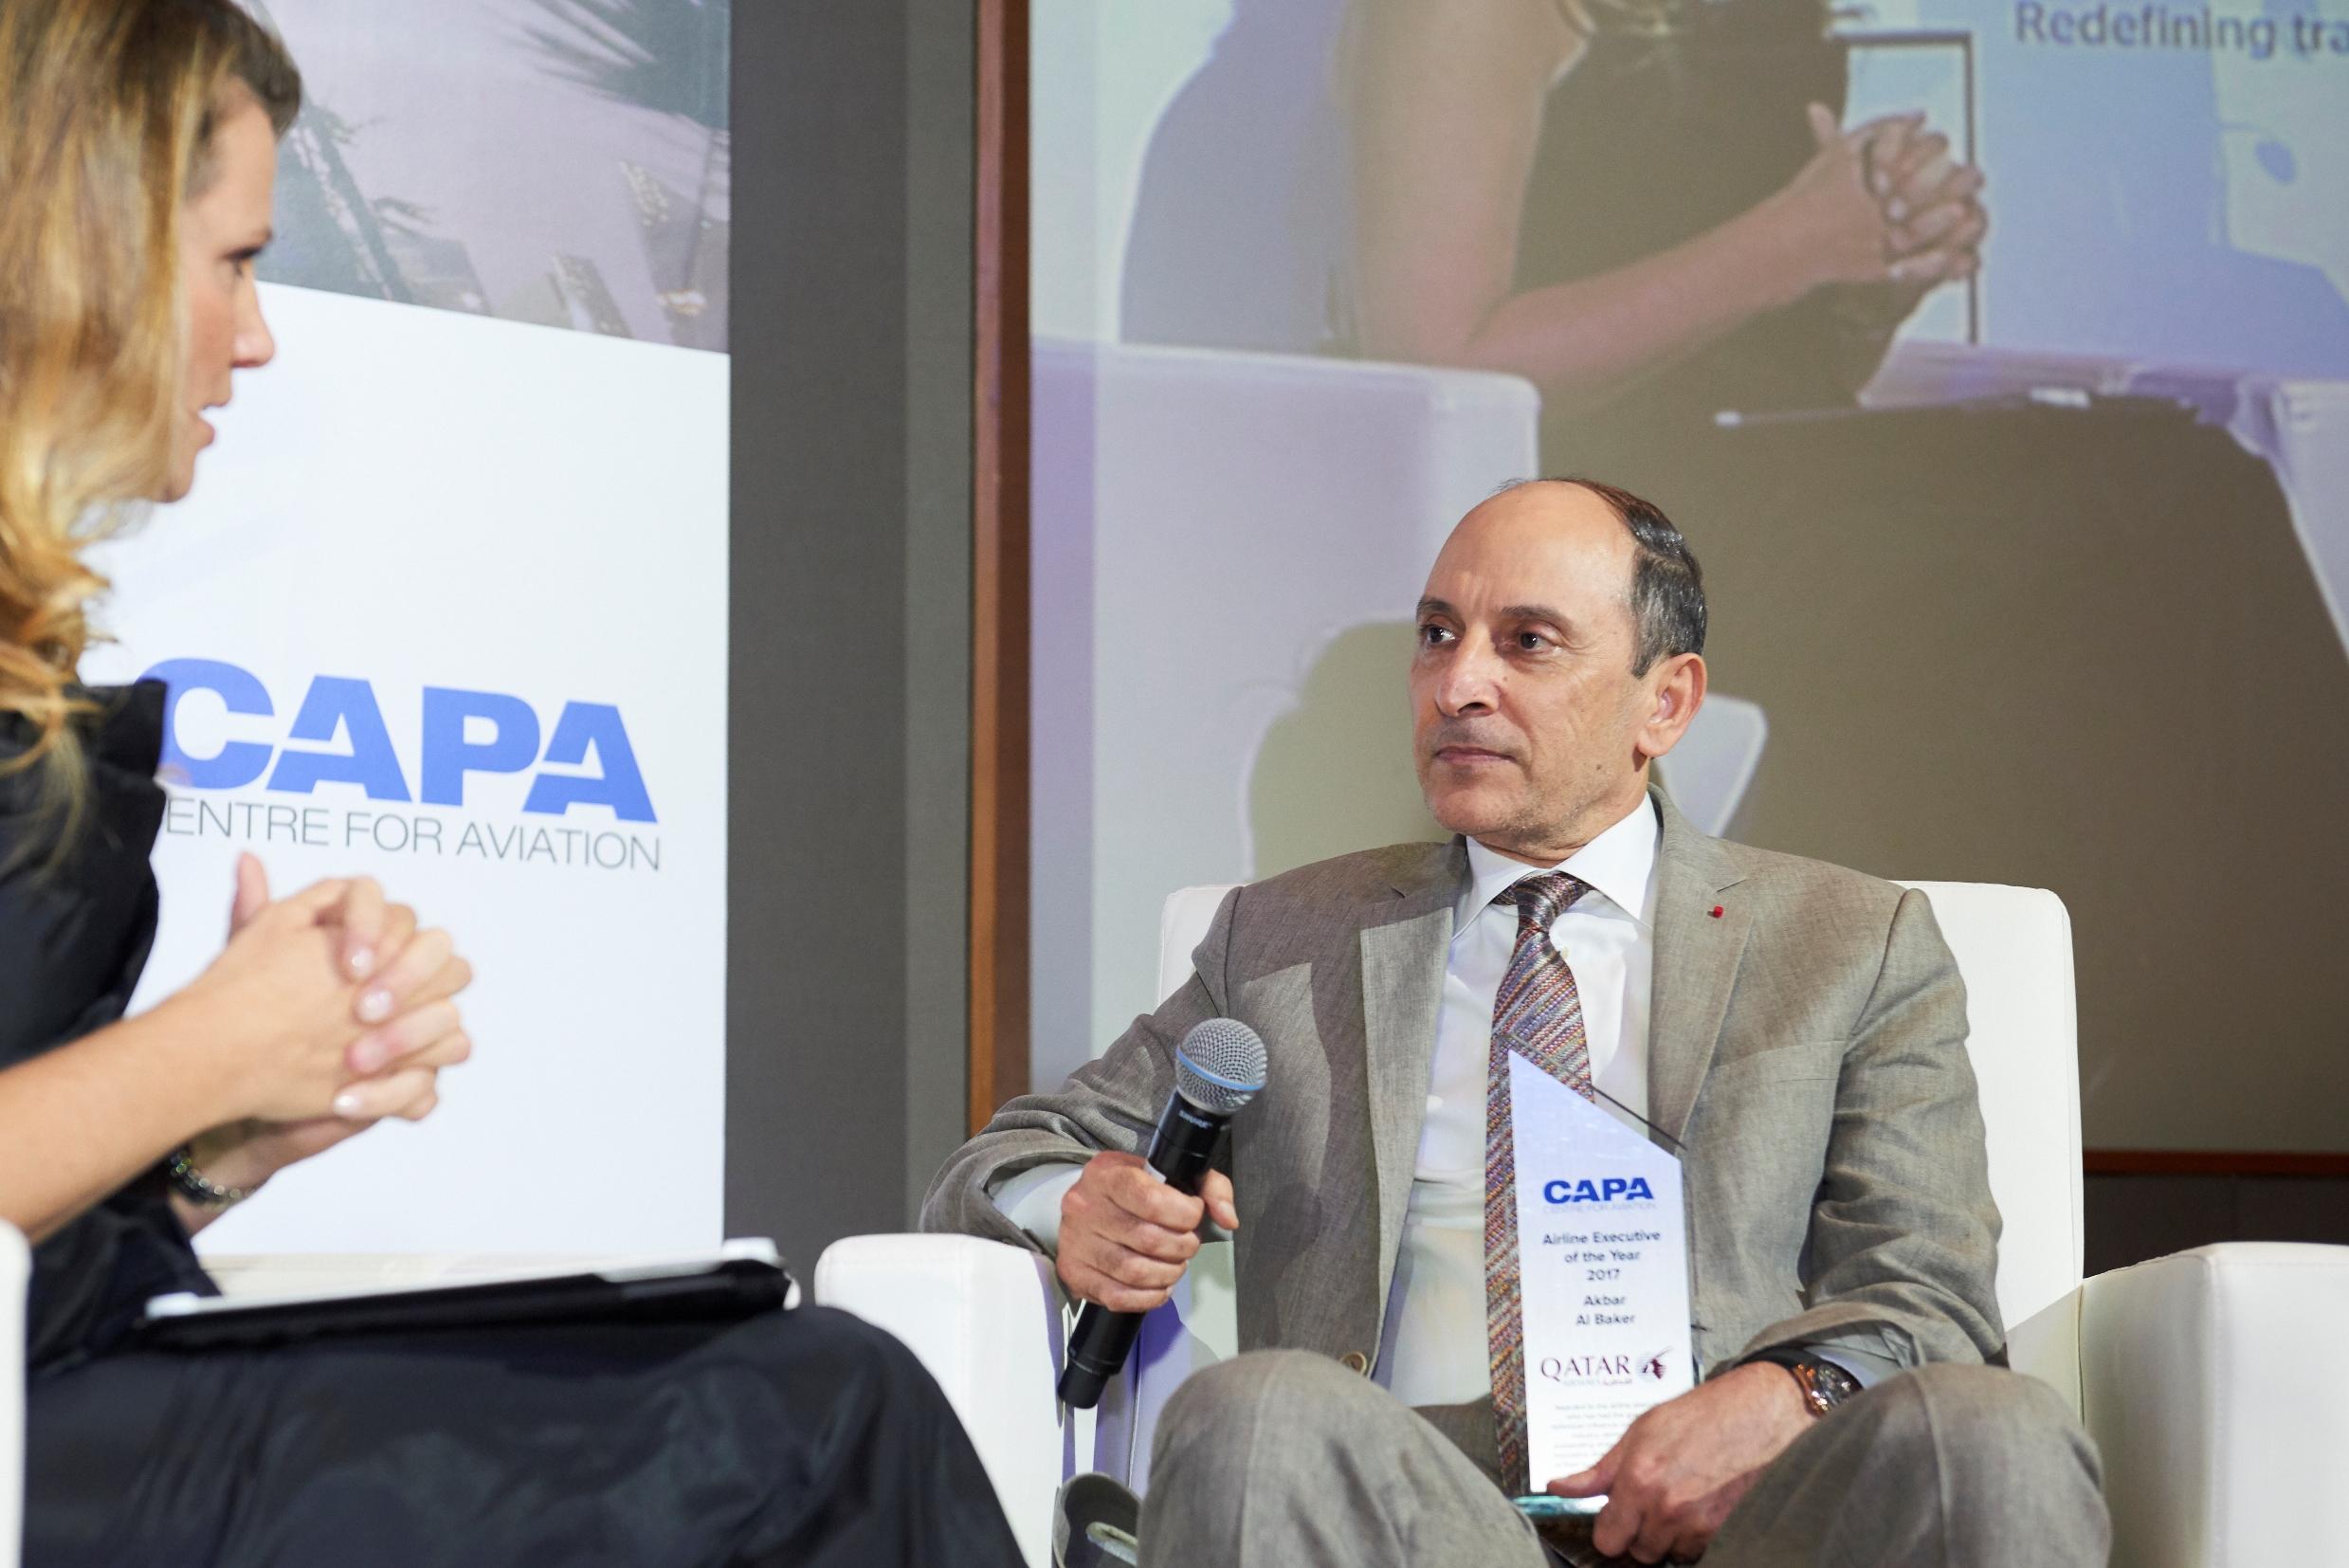 Qatar Airways Group Chief Executive Named 'Aviation